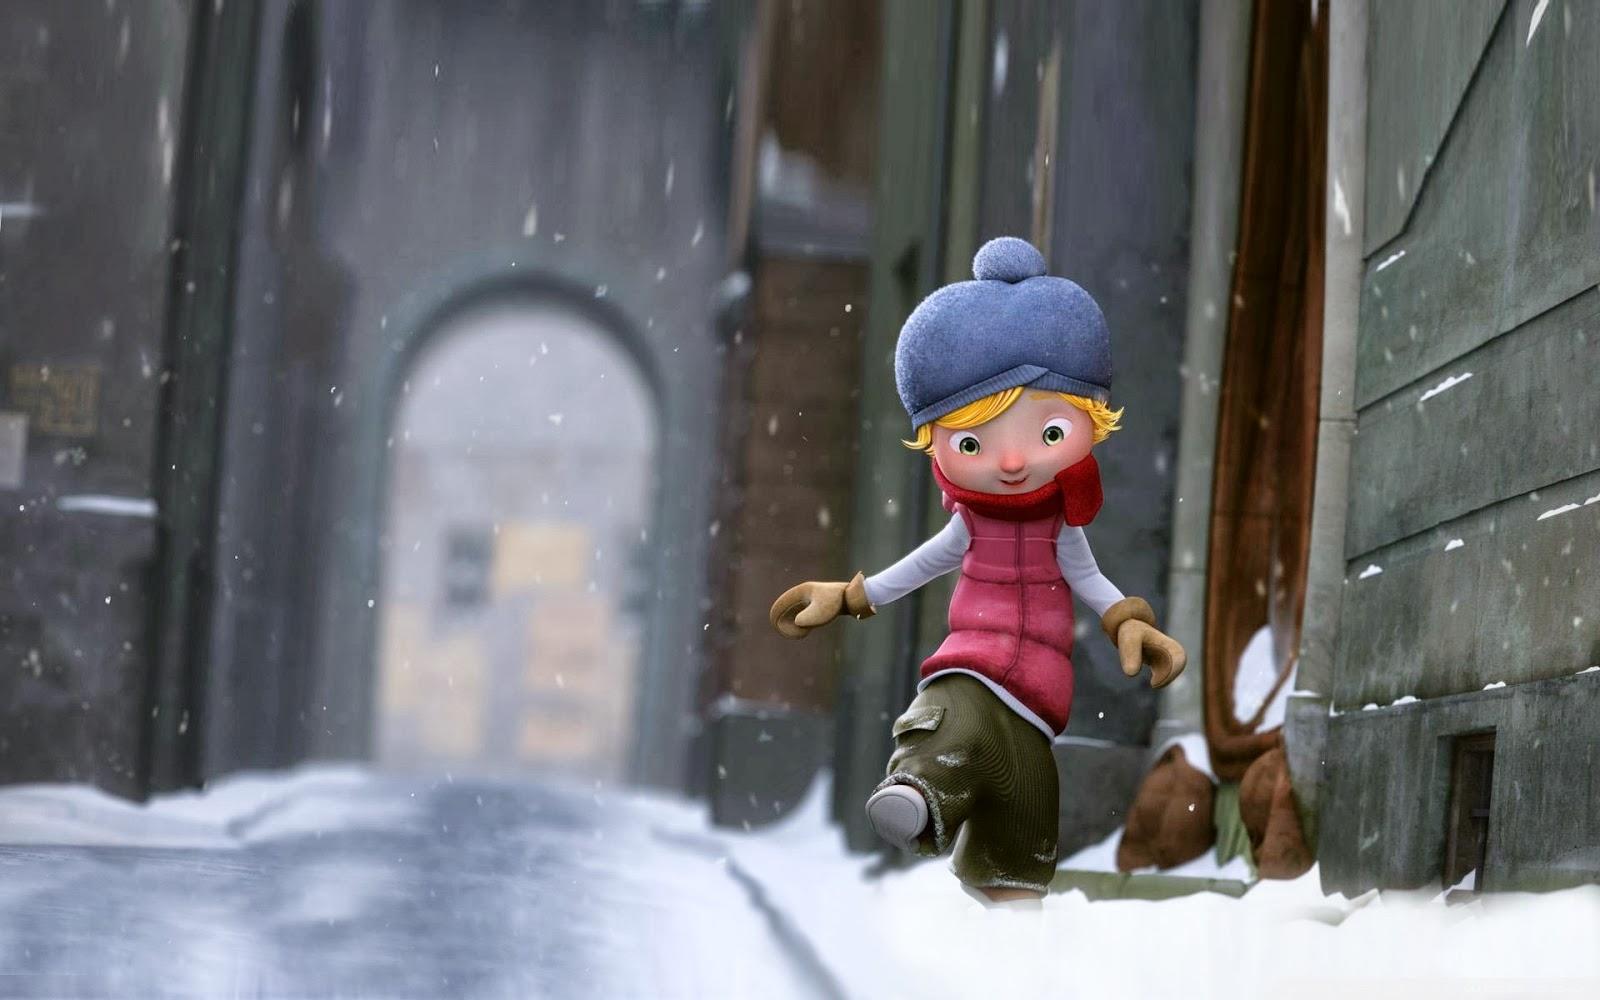 "<img src=""http://1.bp.blogspot.com/-VLoga3QT-vo/Ut5GLeRLt5I/AAAAAAAAJis/gm6K-kYcak8/s1600/winter-joy.jpg"" alt=""winter joy"" />"